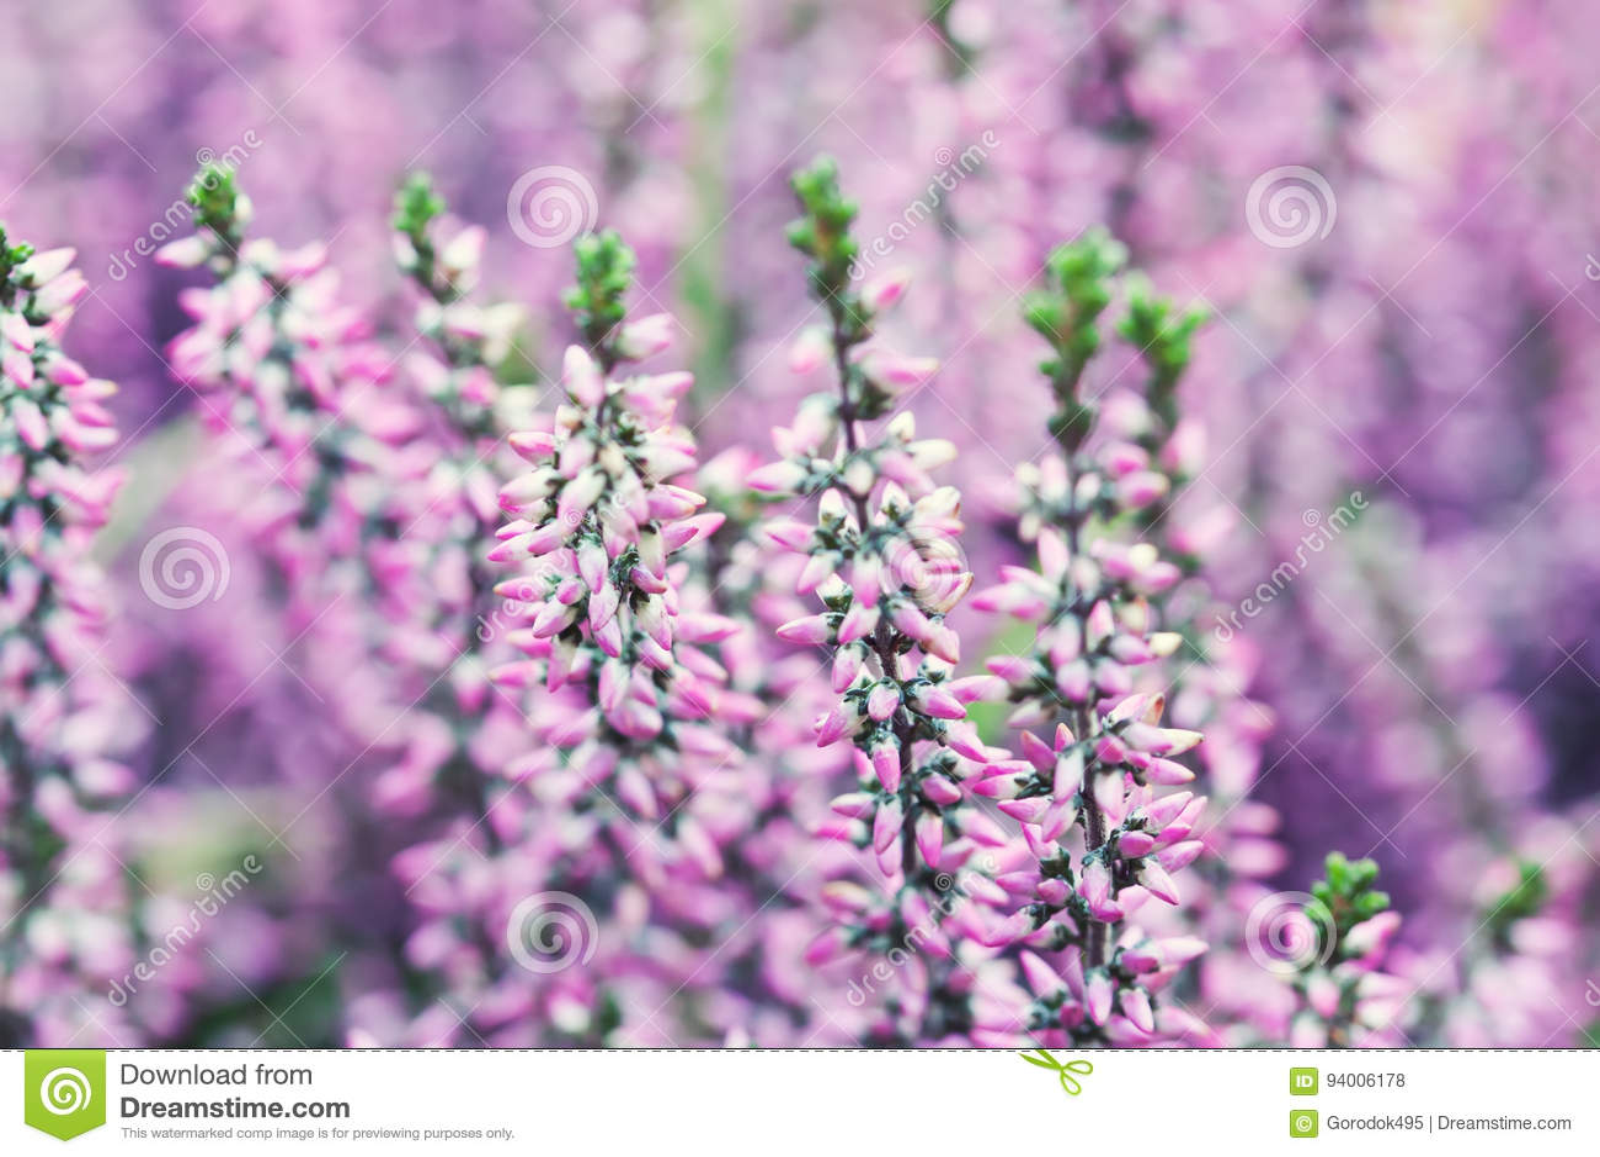 Violet Heather Flowers Field Calluna Vulgaris Small Pink Lilac